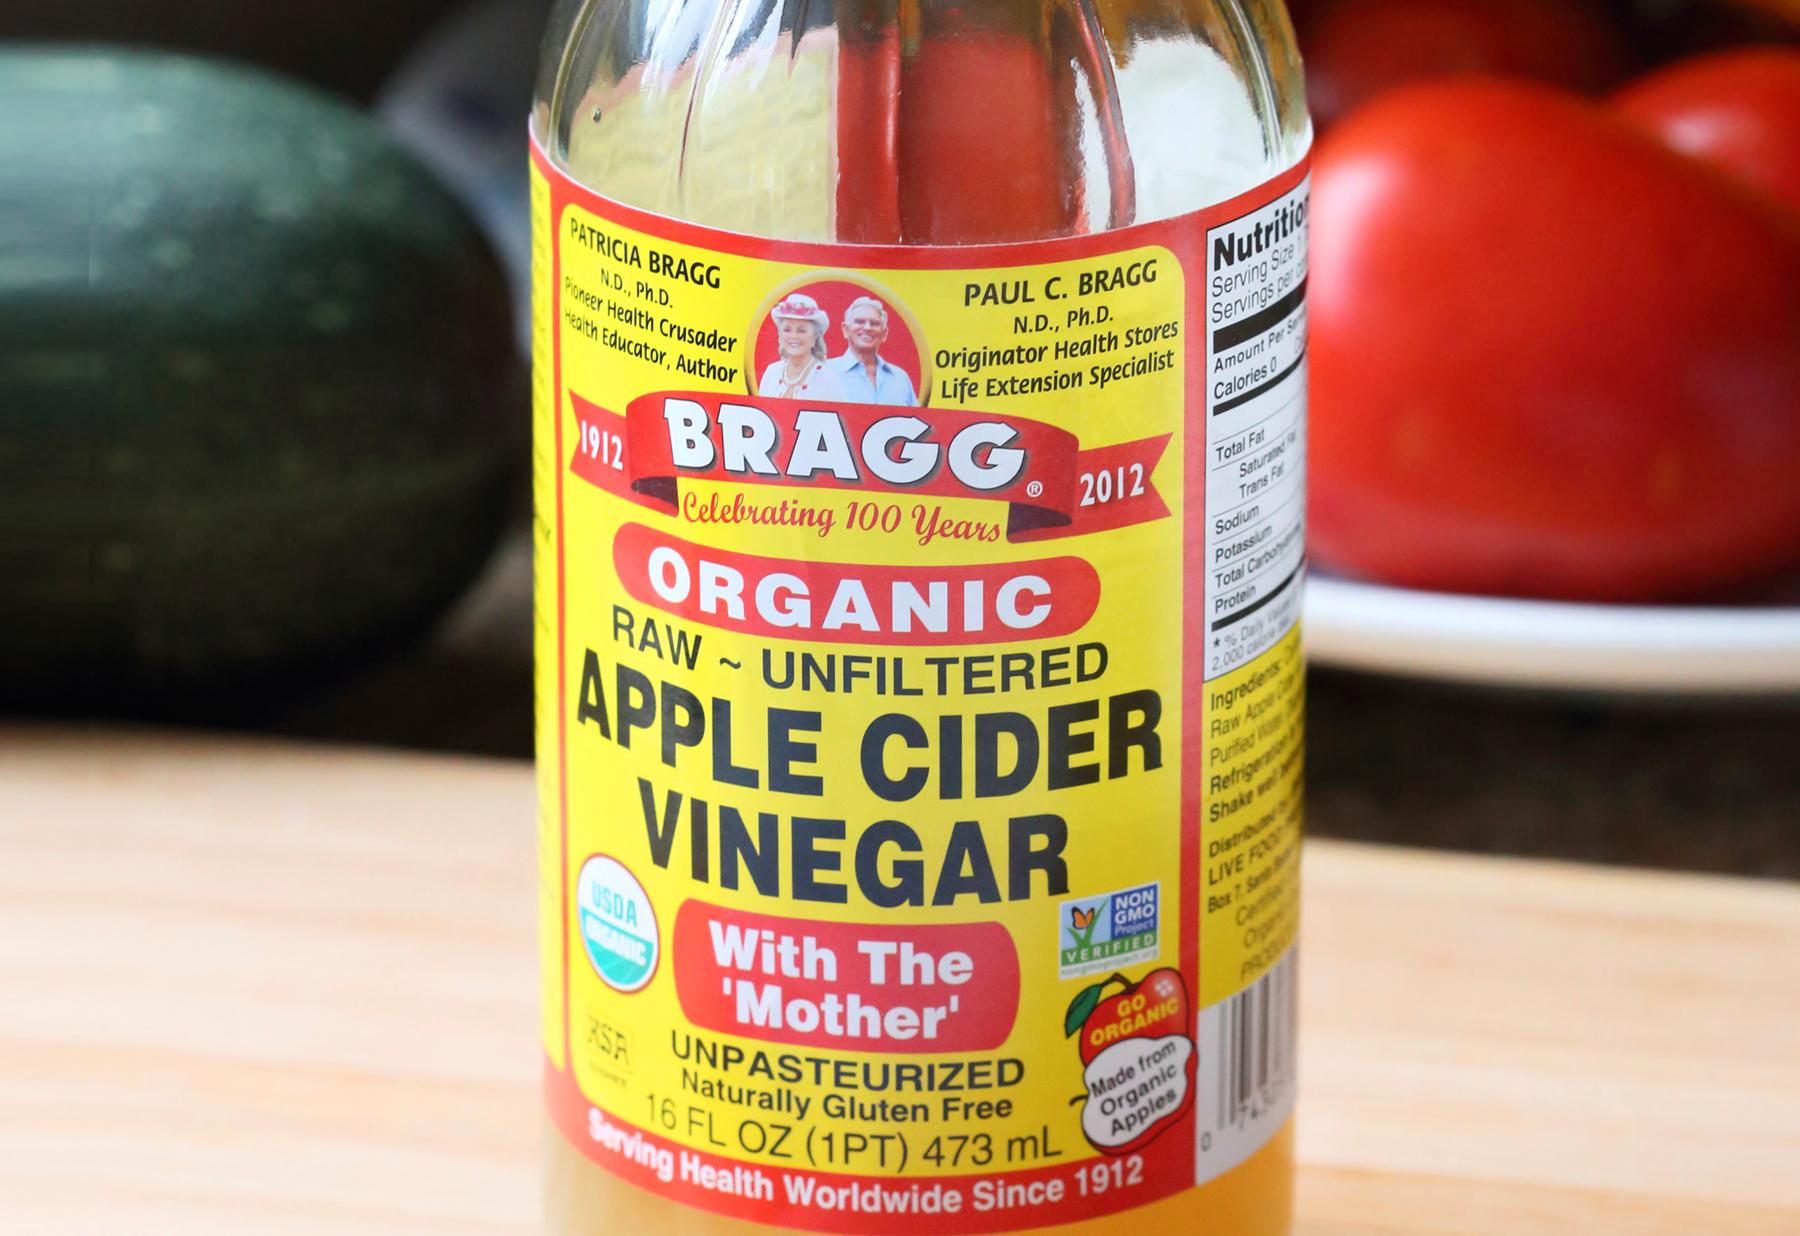 20 Ways to Use Apple Cider Vinegar2